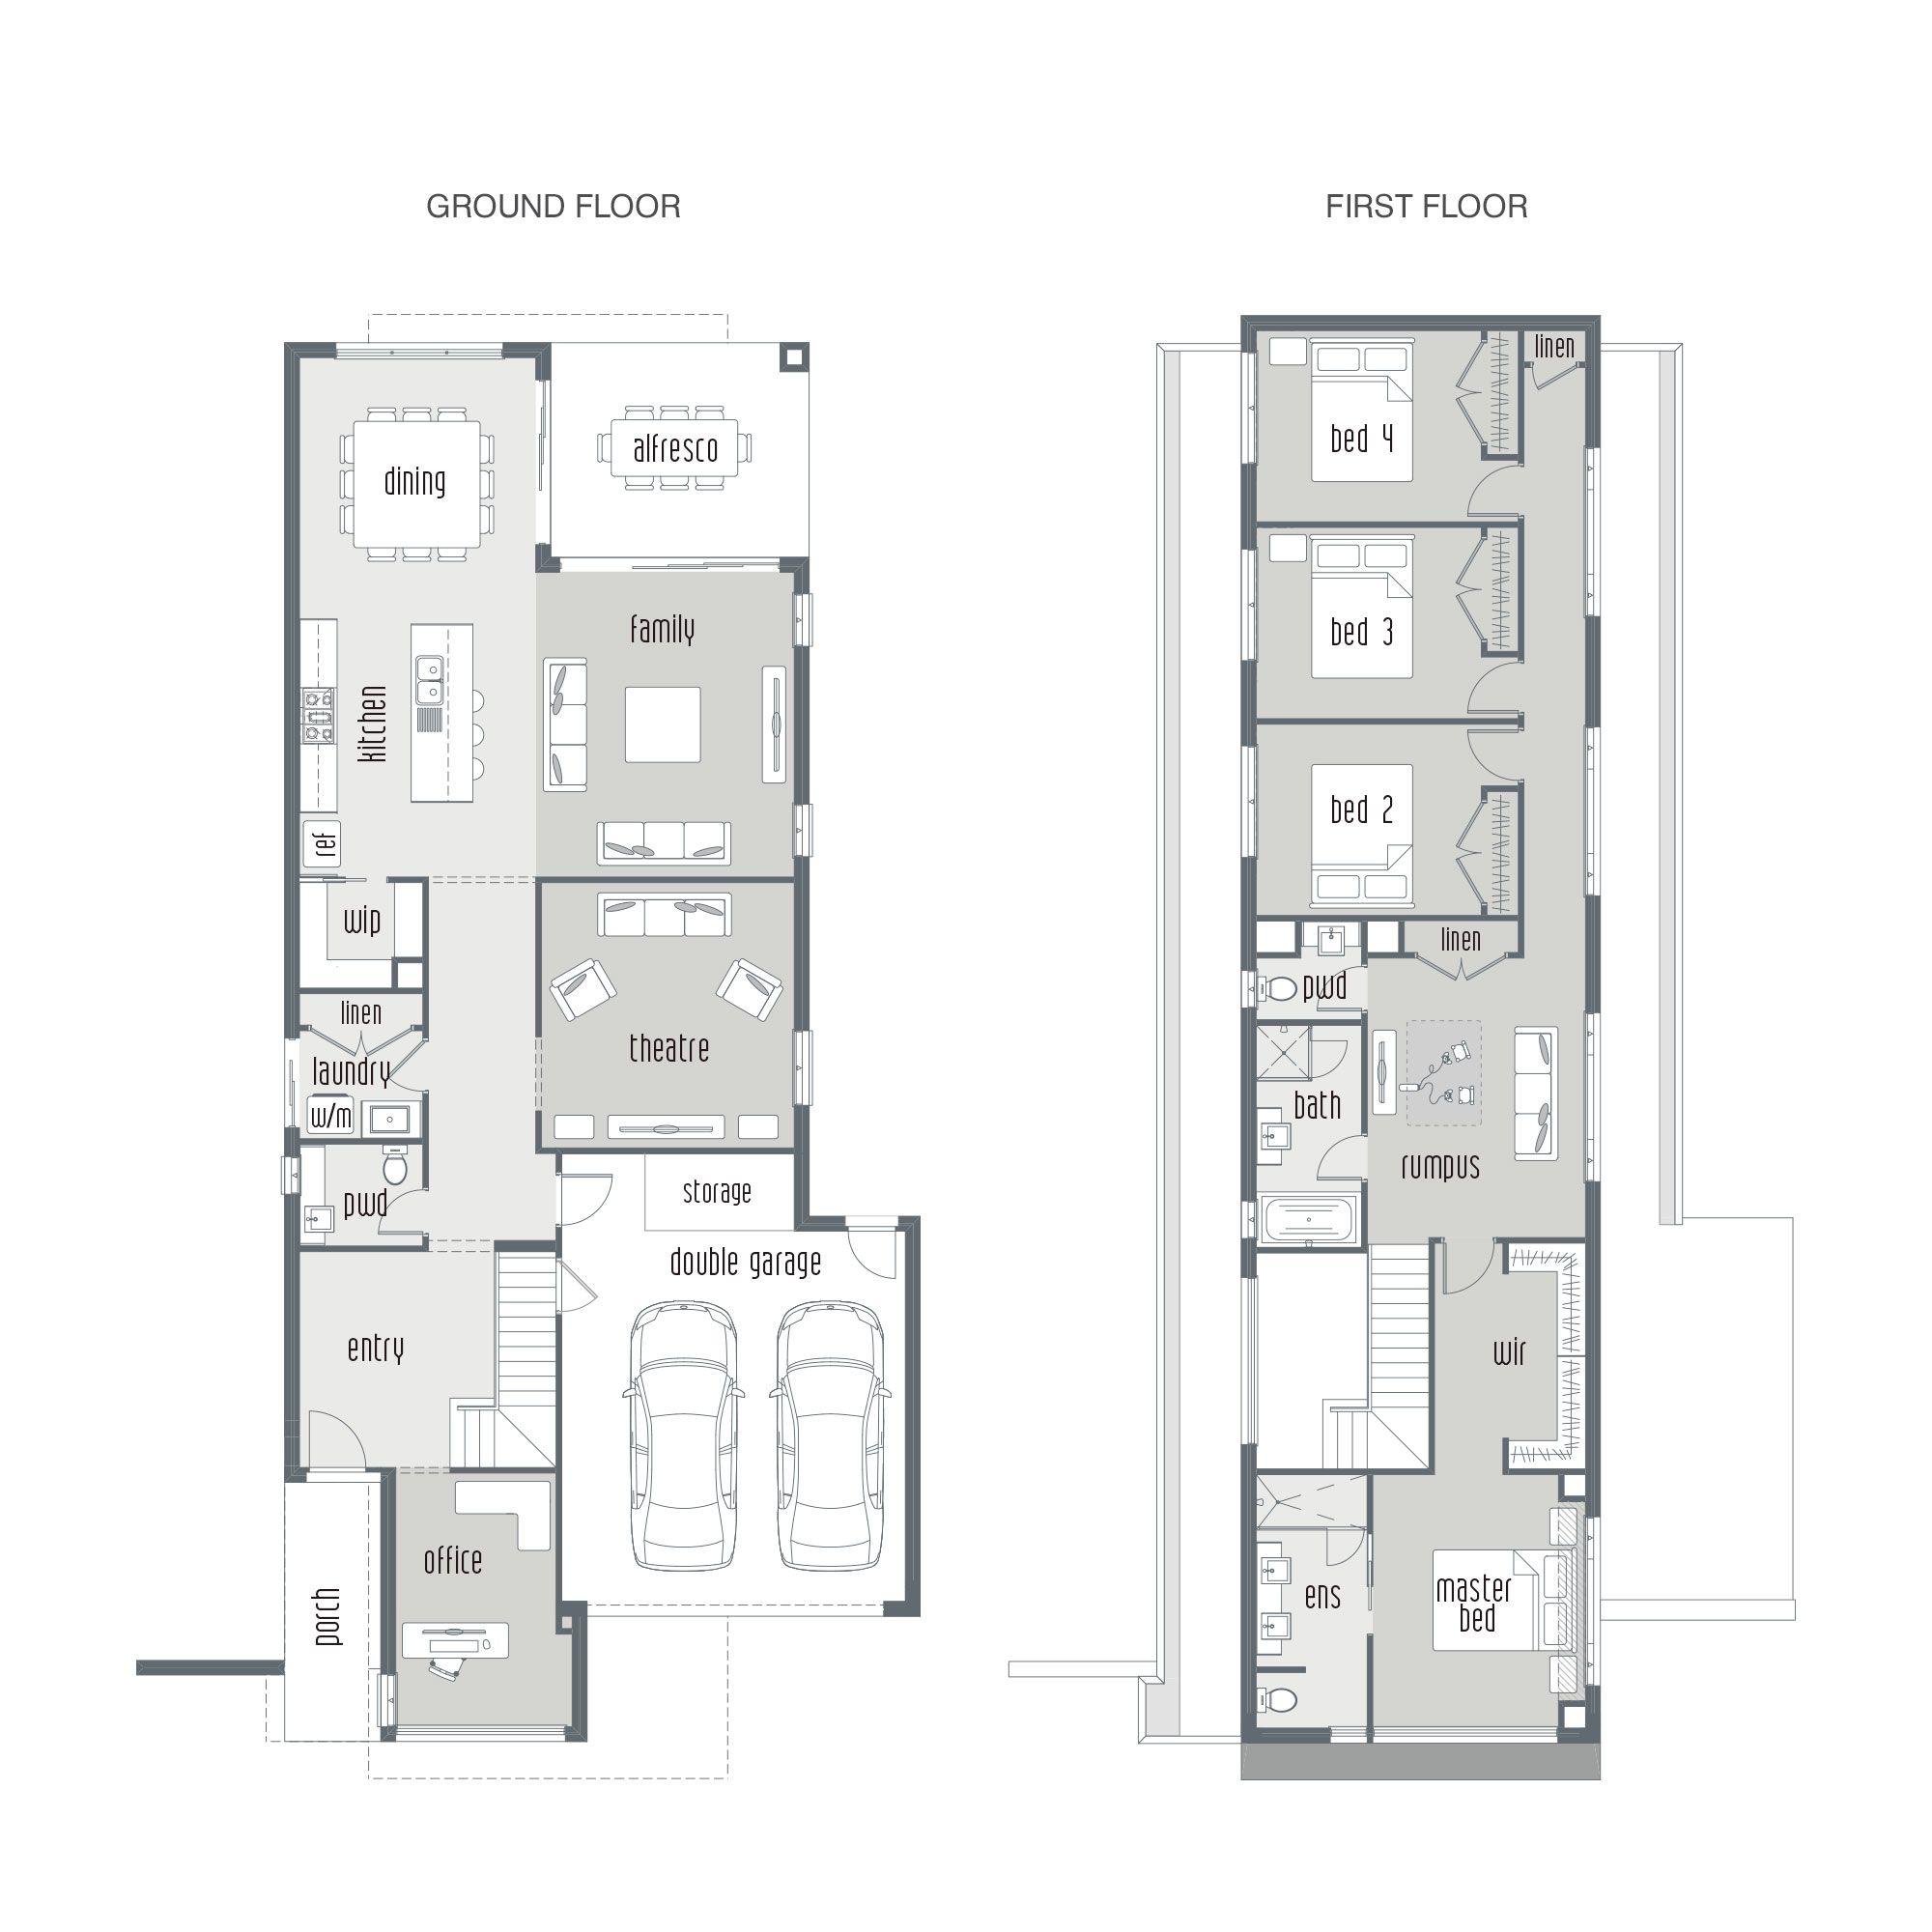 Block Home Designs Narrow: Dual Occupancy House Plans - Google Search